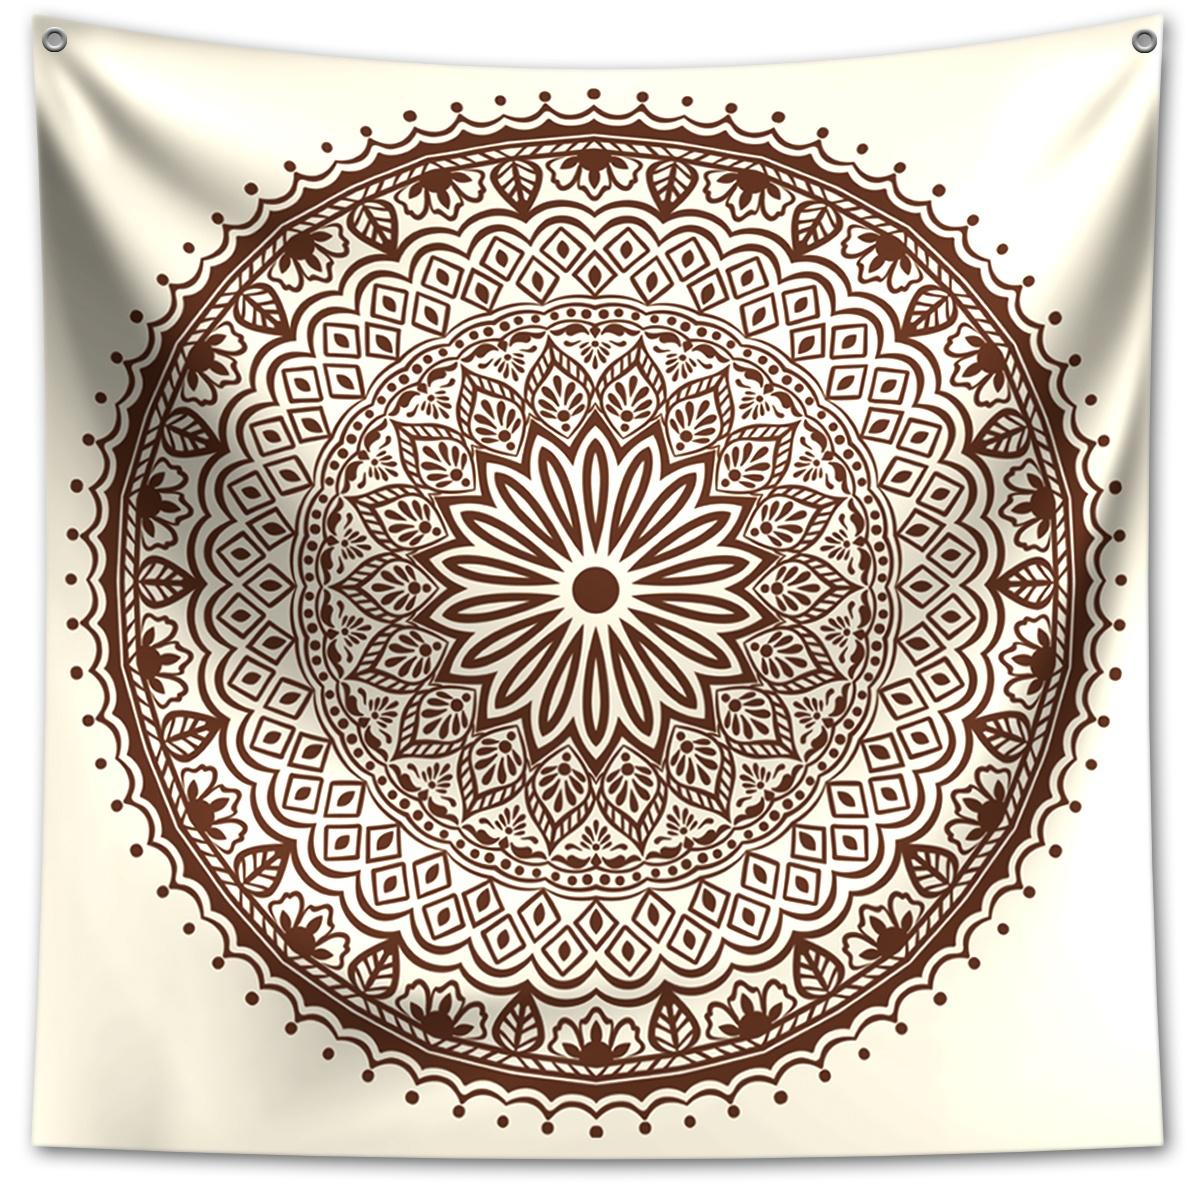 Panô Decorativo Mandala Bege - Banner